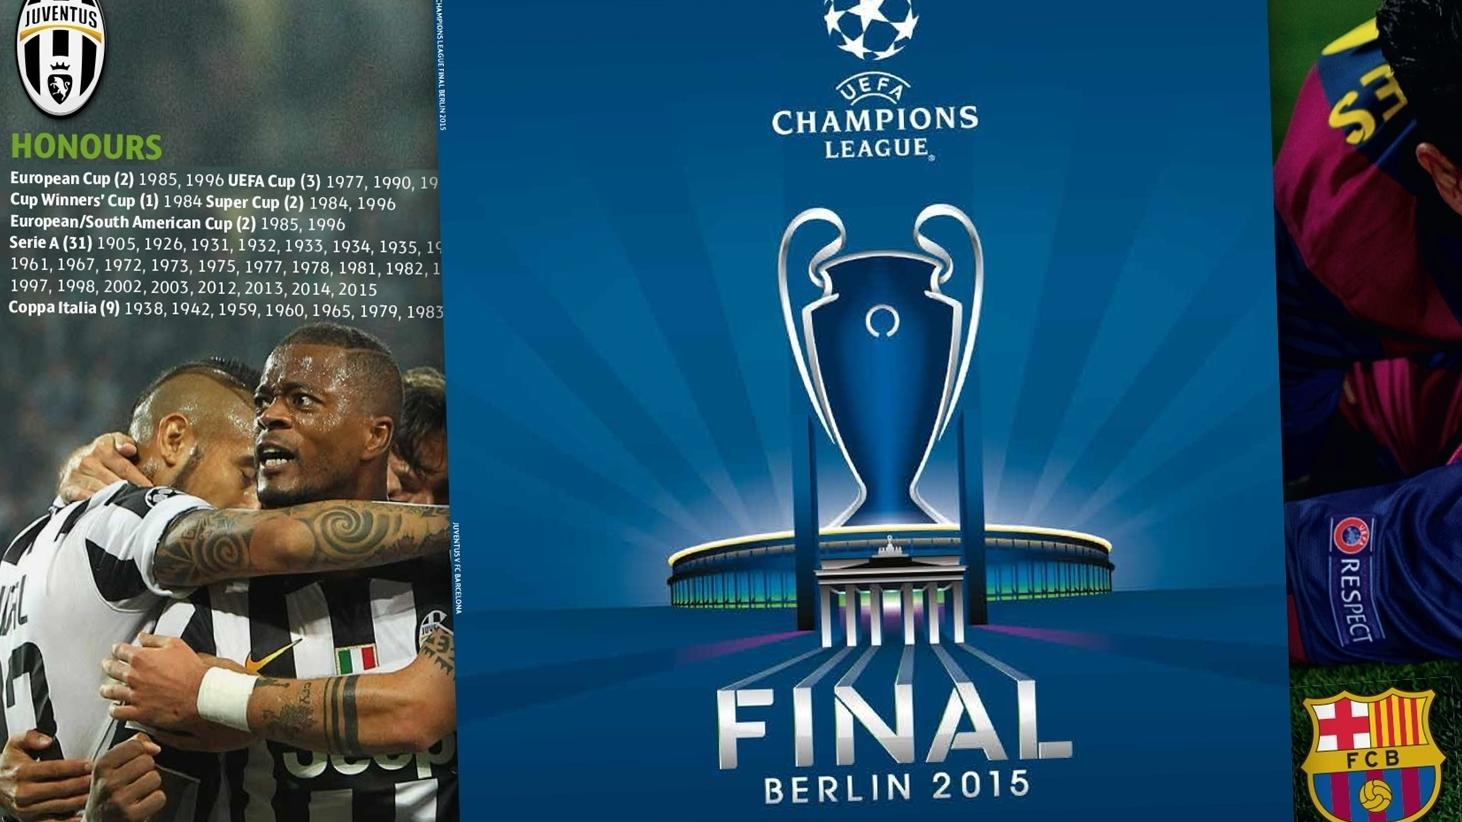 Champions League Jetzt